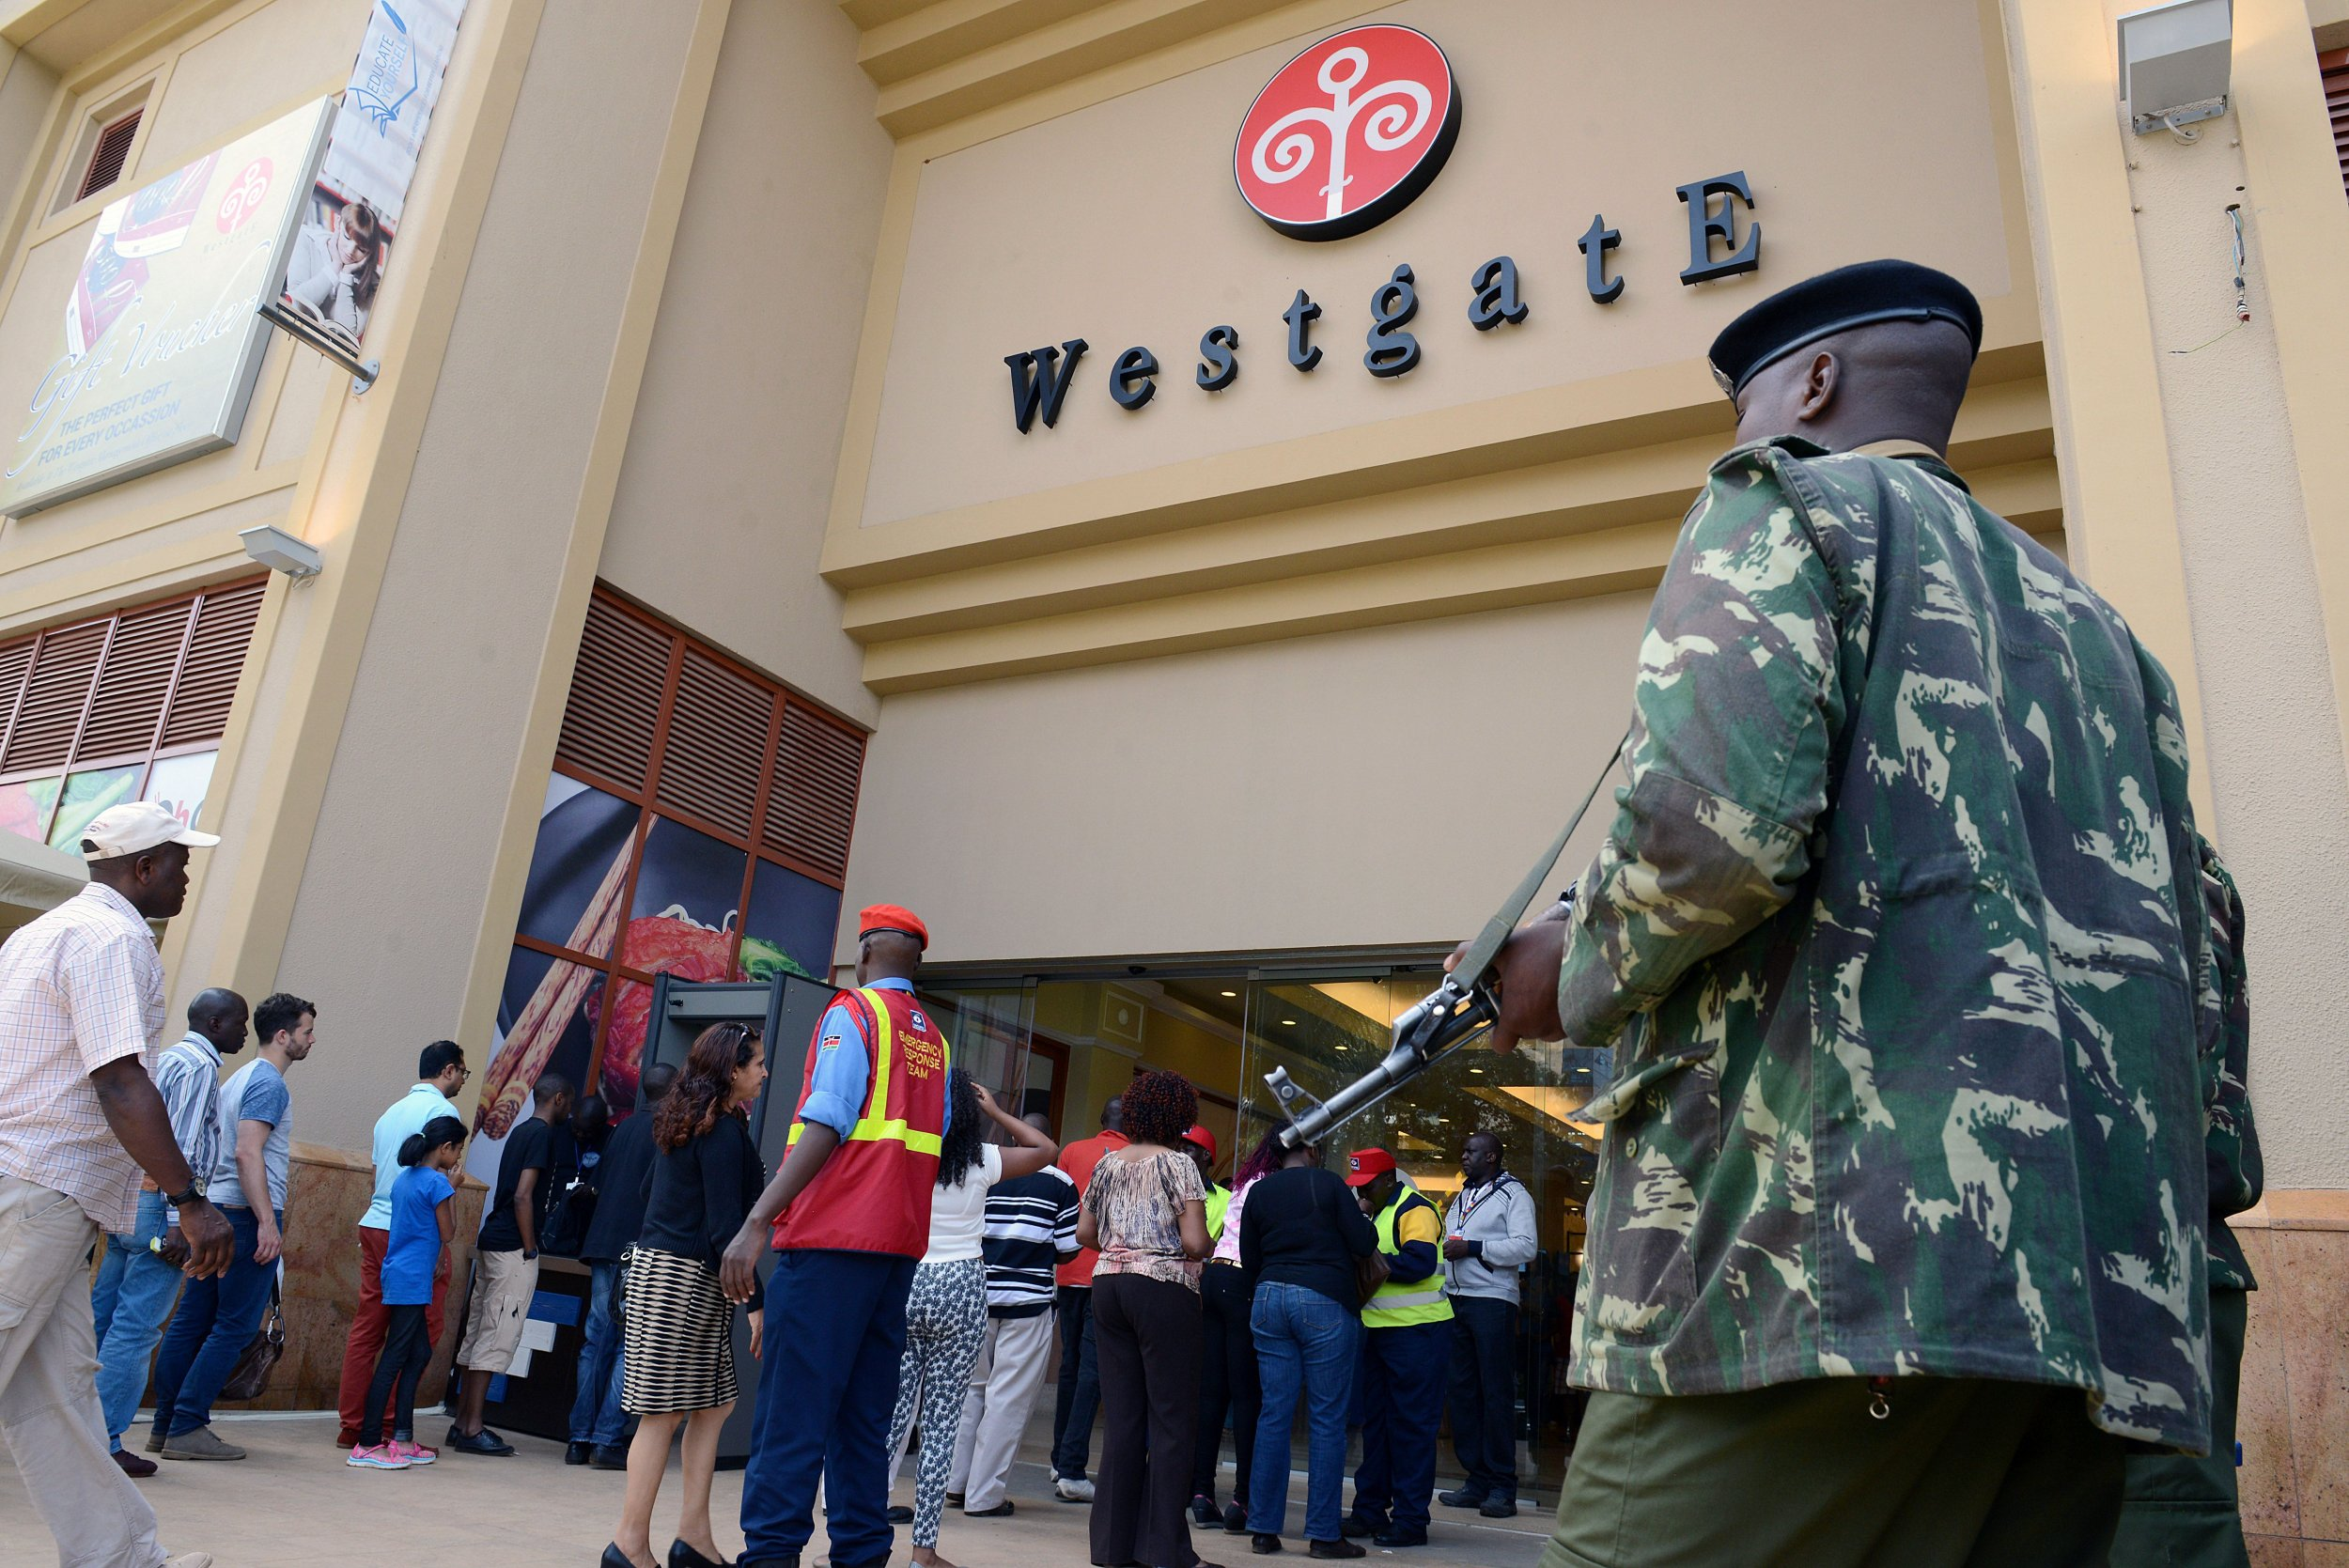 0121_Westgate_Nairobi